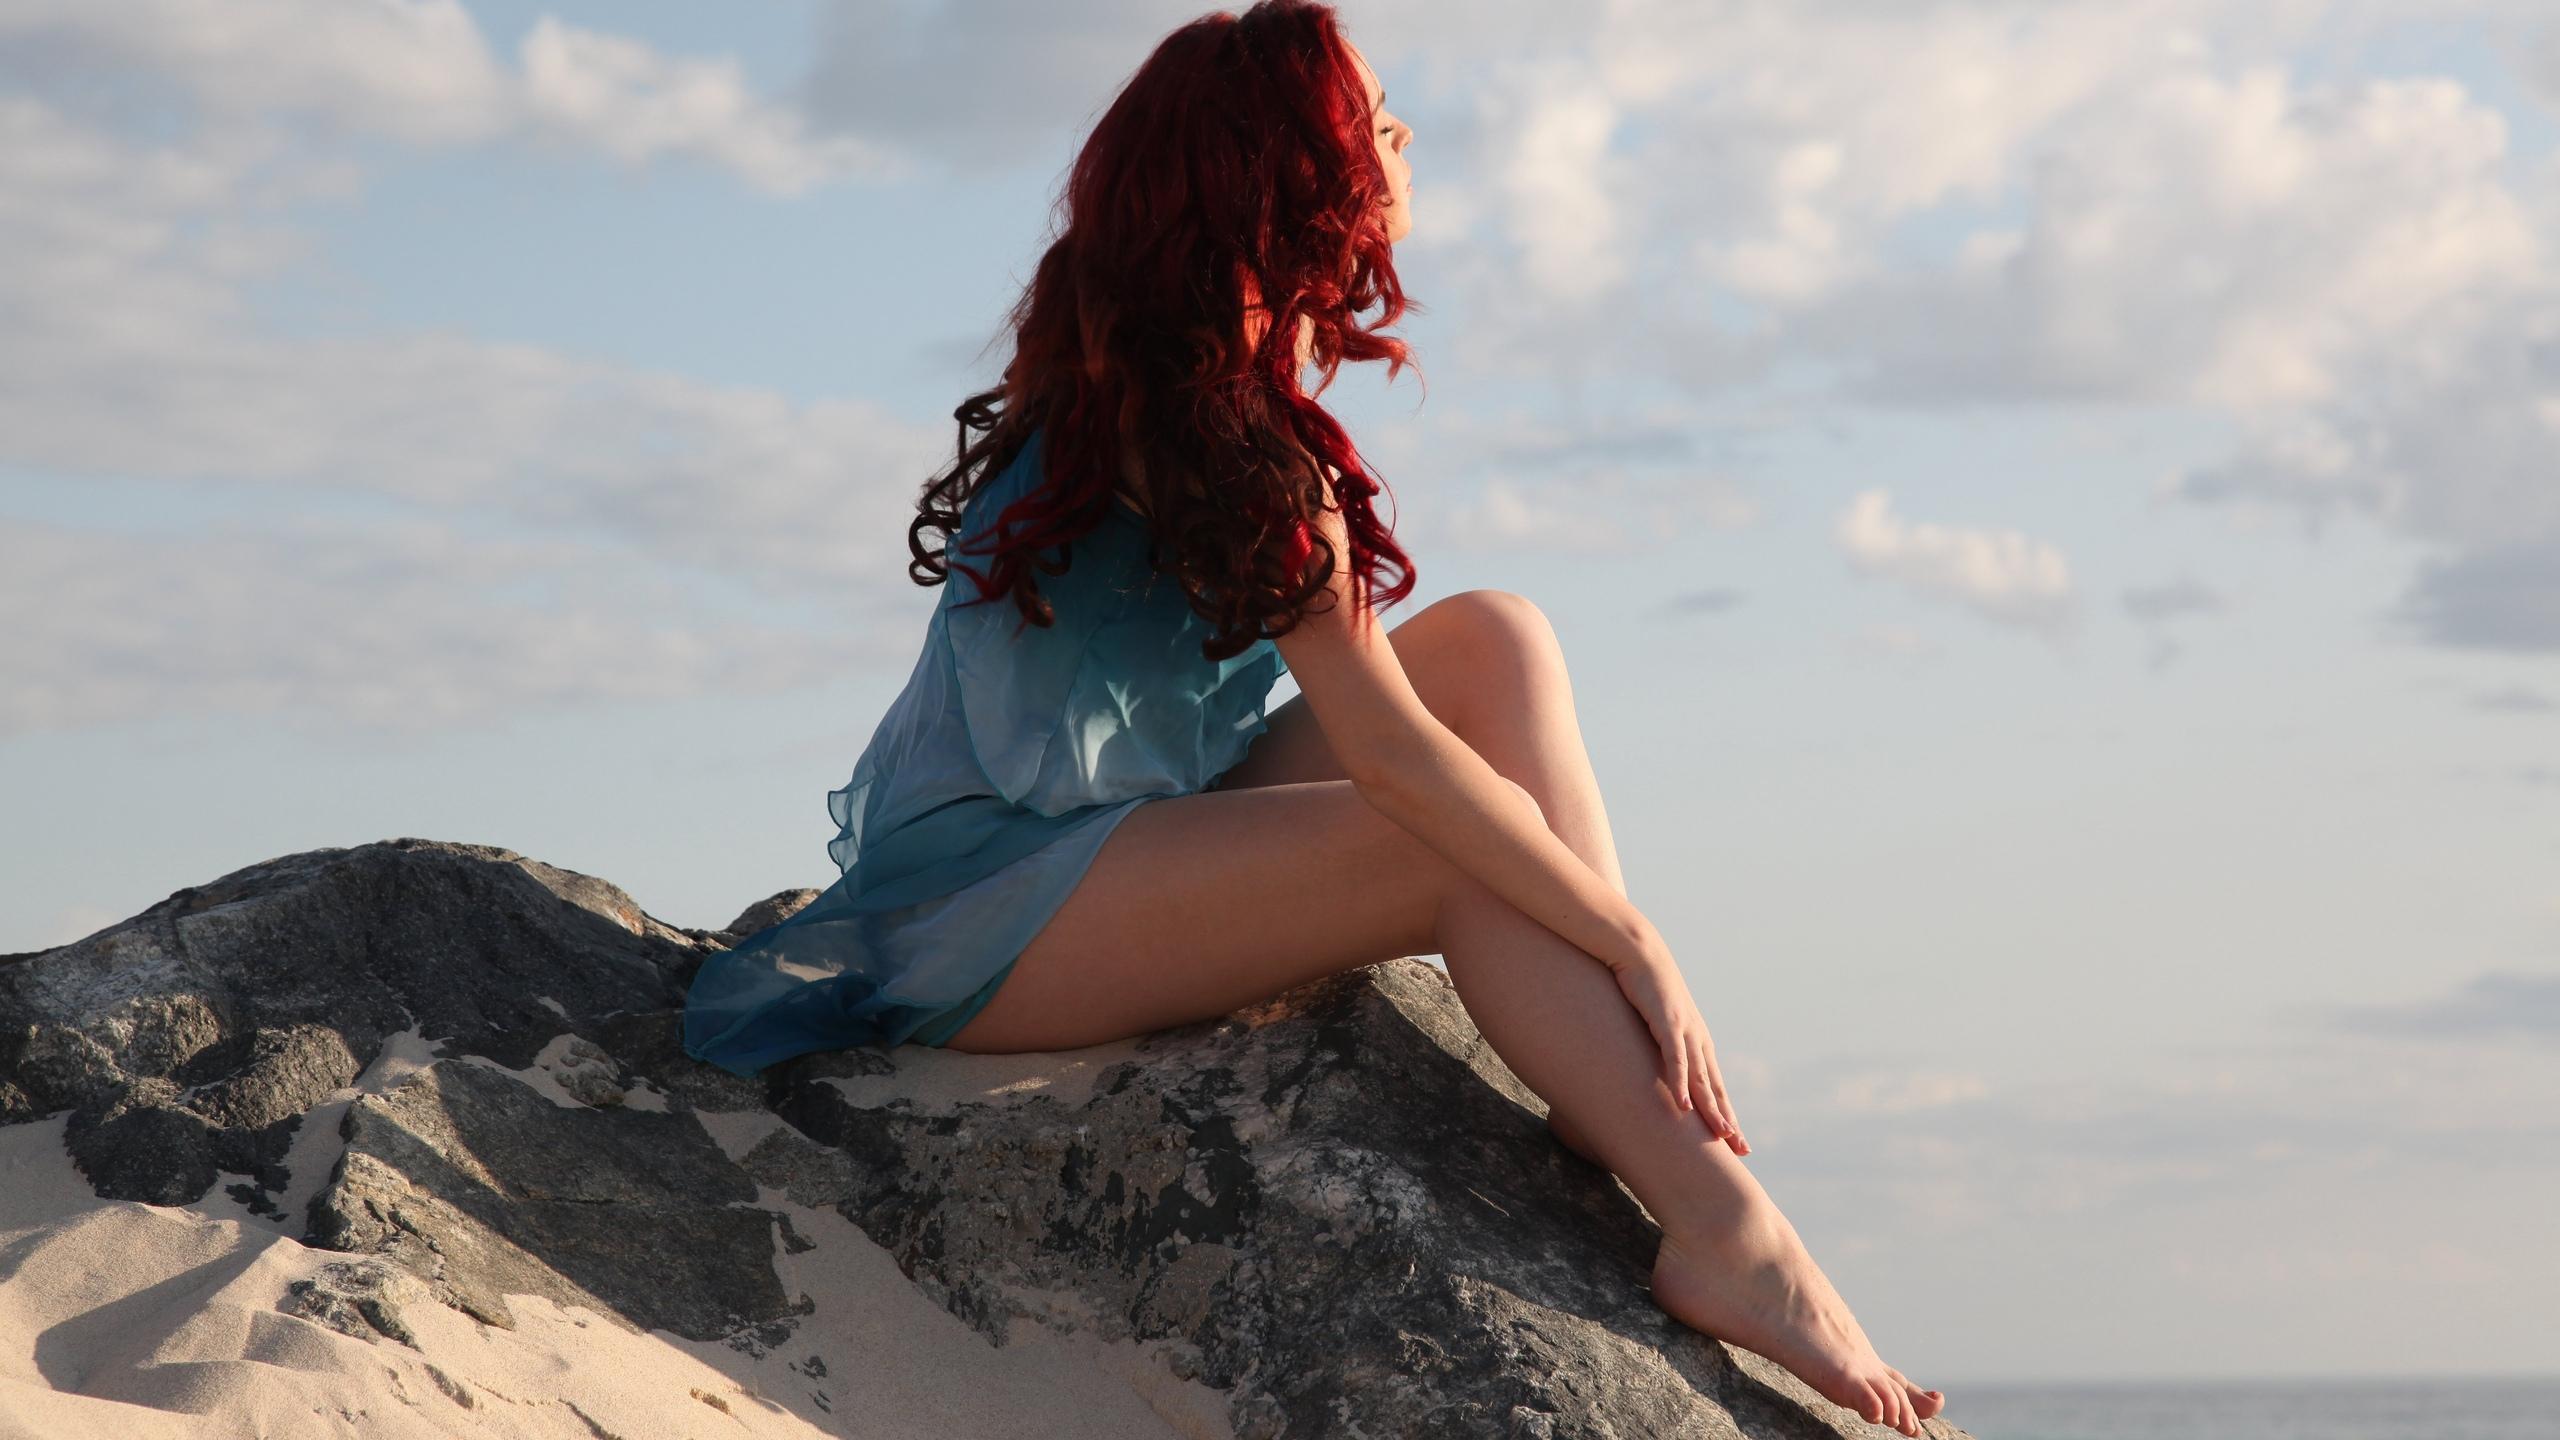 девушка, с рыжими, волосами, сидит, на камне